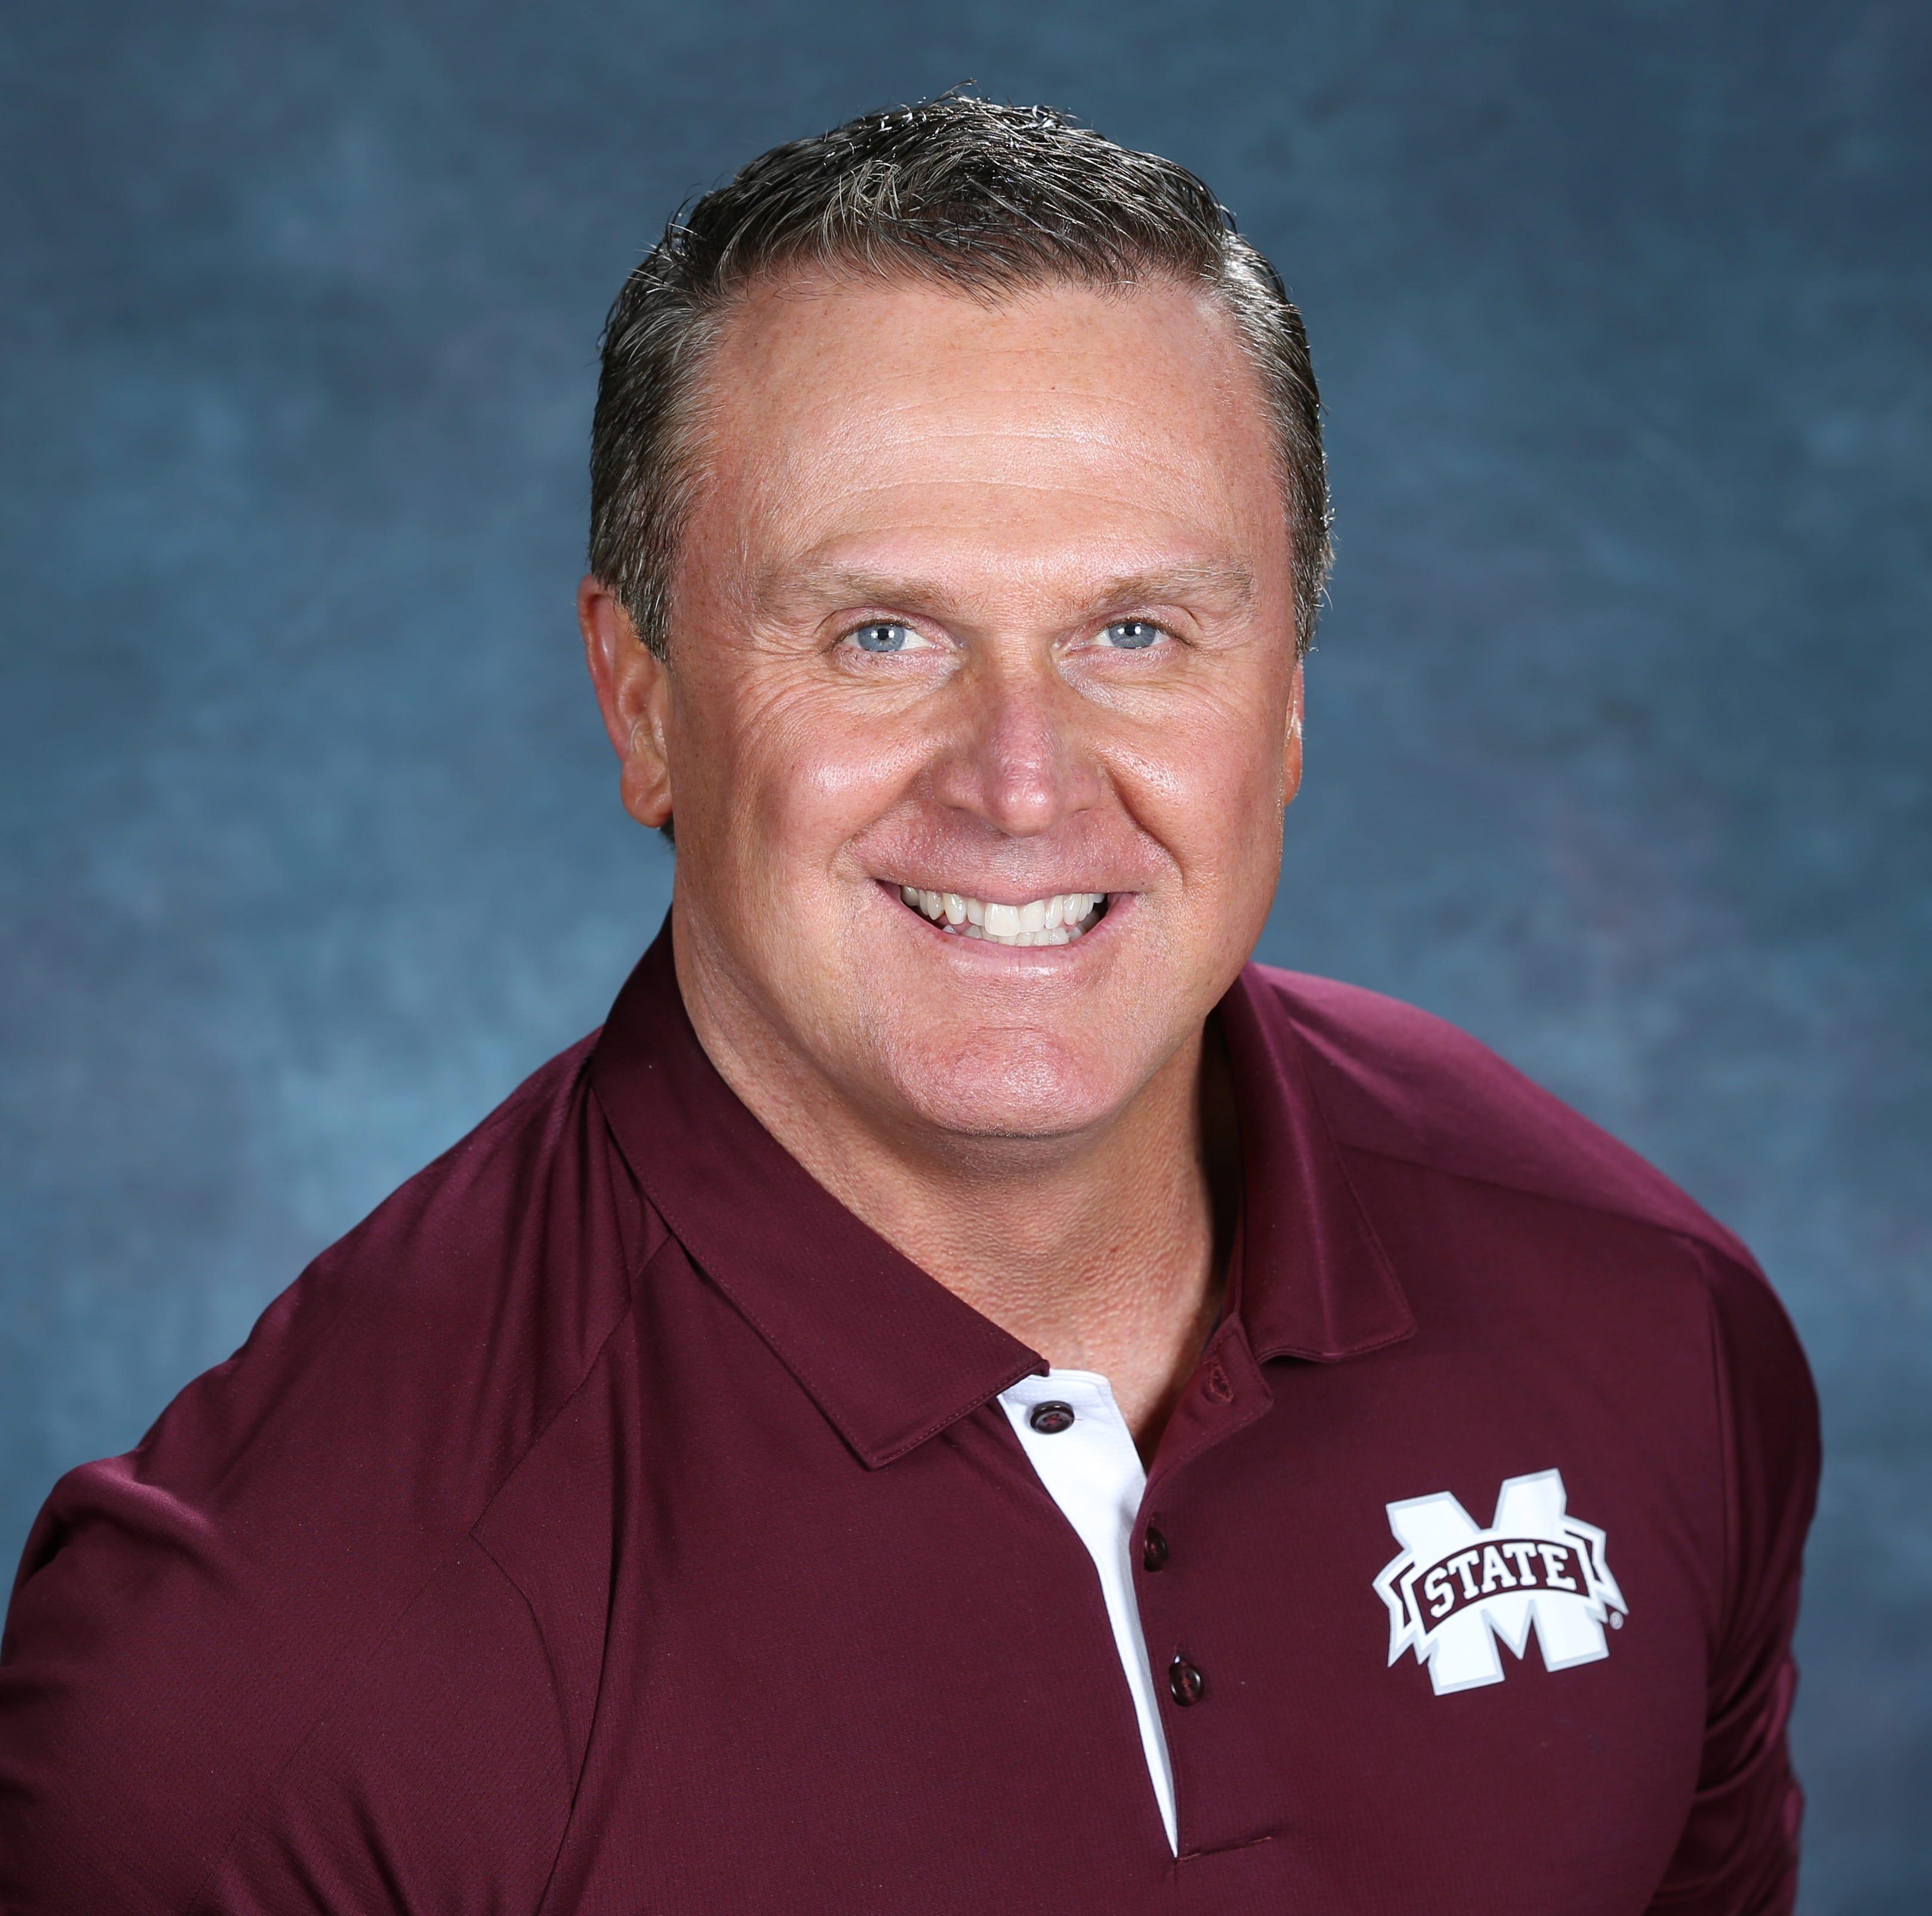 Mississippi State associate head coach Mark Hudspeth